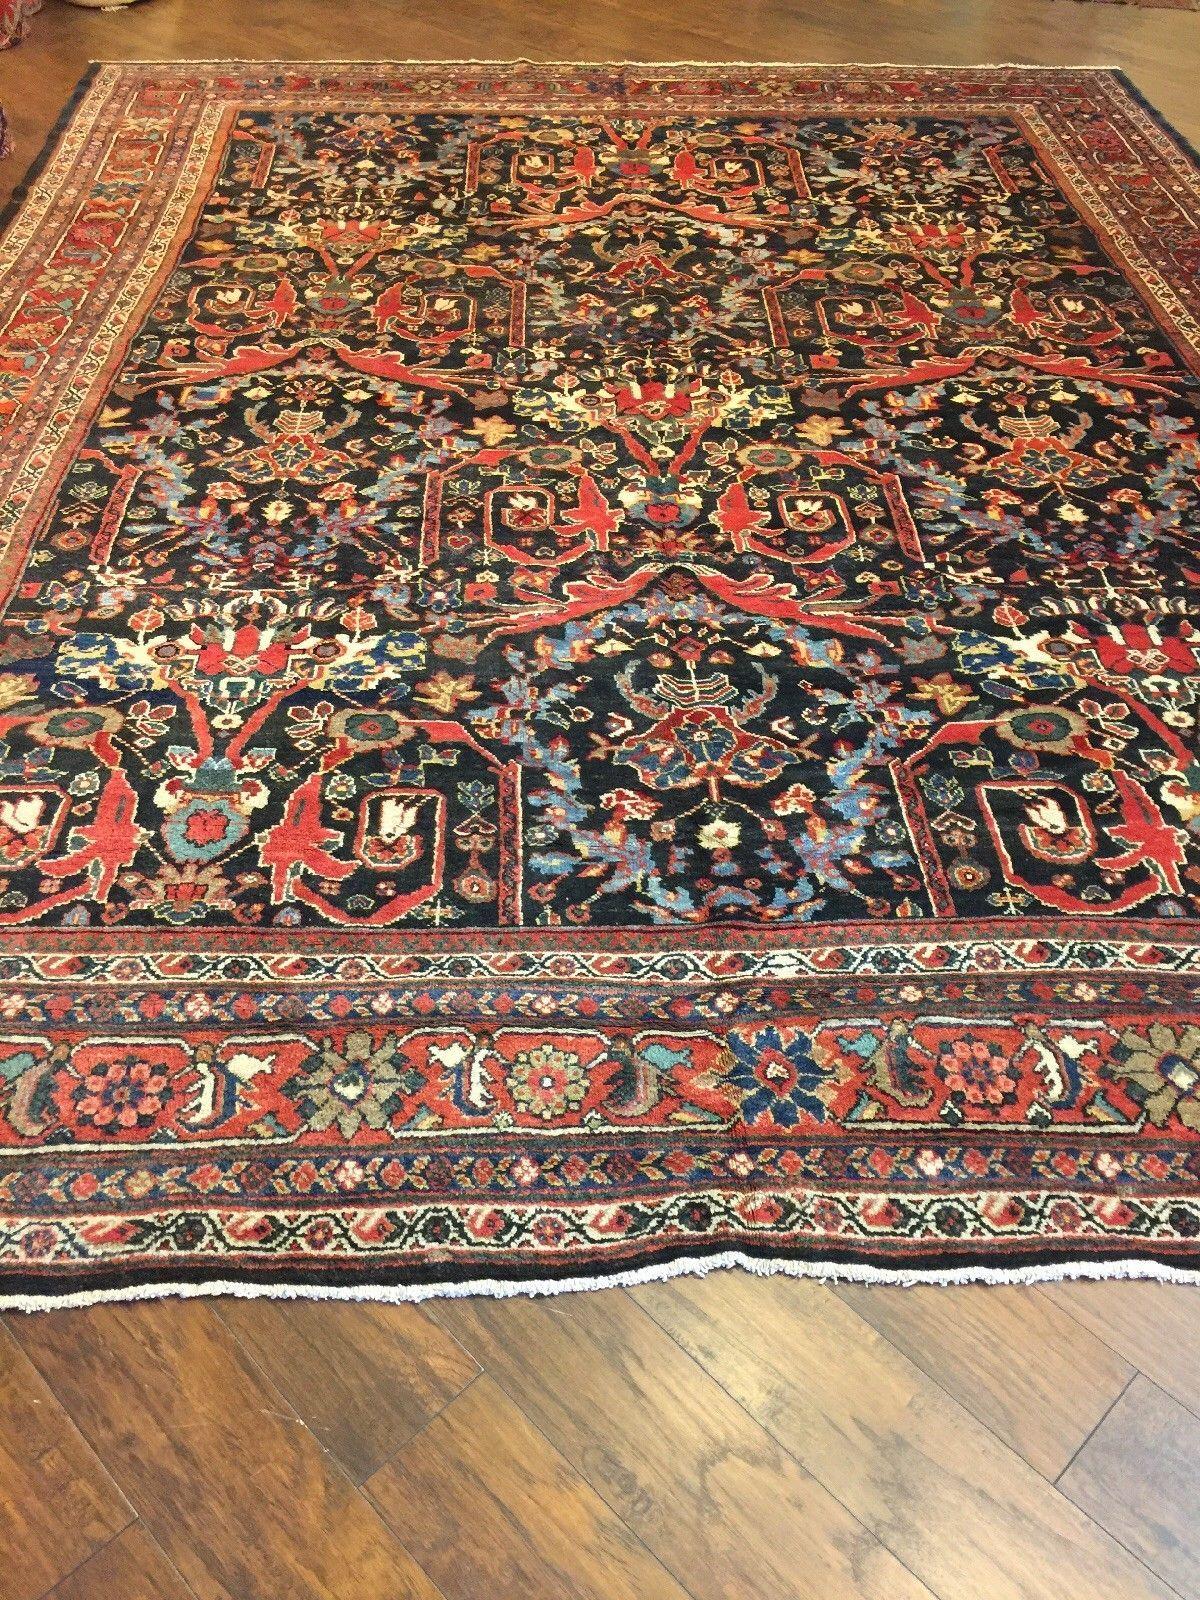 11x14 Handmade Antique Persian Mahal Wool Oriental Rug Ebay